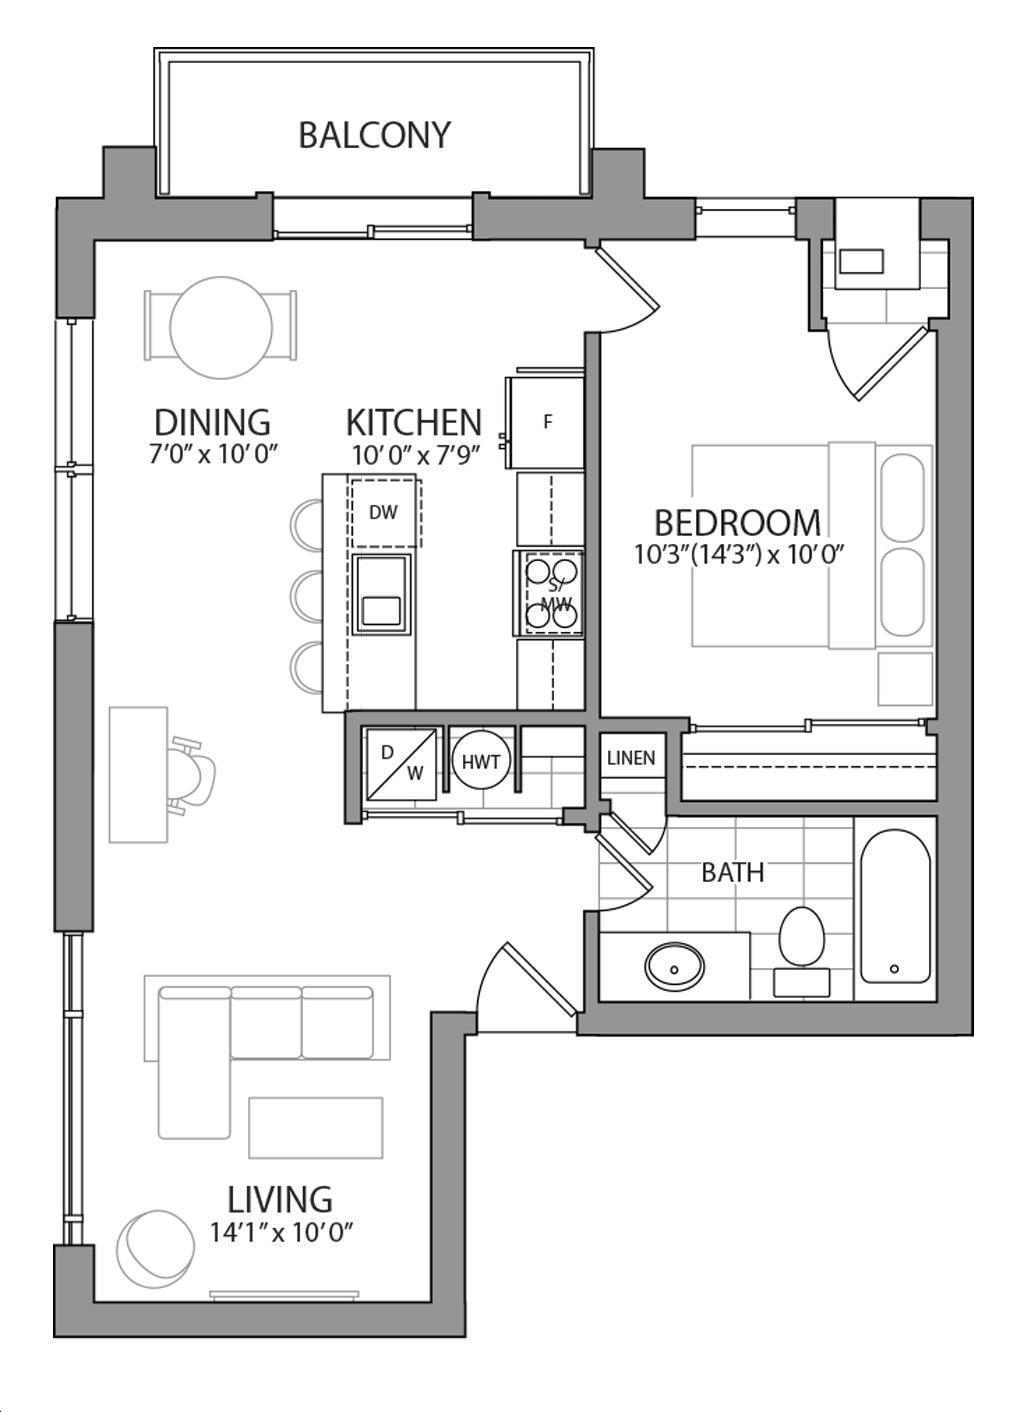 Q1222 Condos by calibrex-Development- Unit 12222 Floorplan 1222 bed & 1222 bath